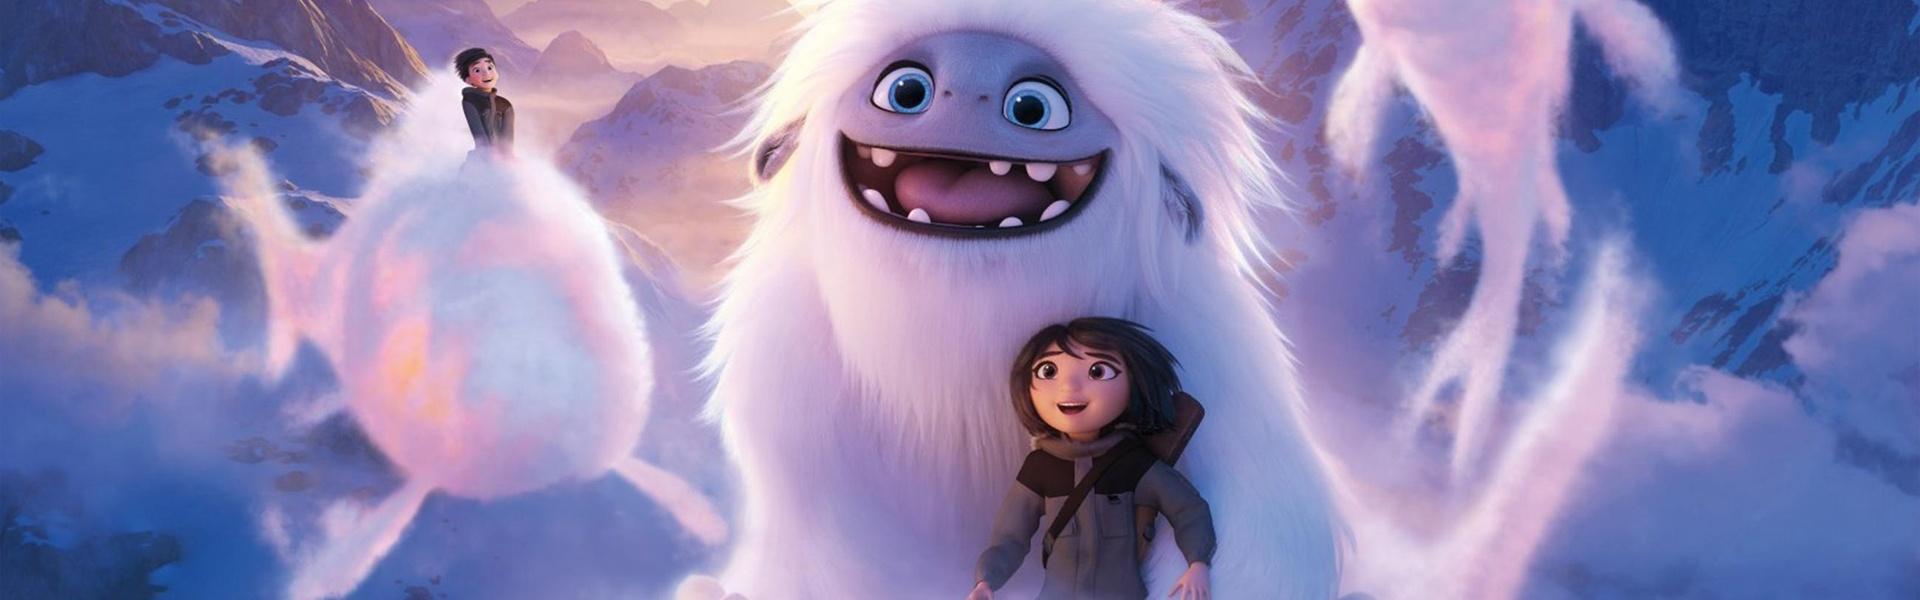 Winter Carnival Free Indoor Community Movie Night • Saturday, February 8